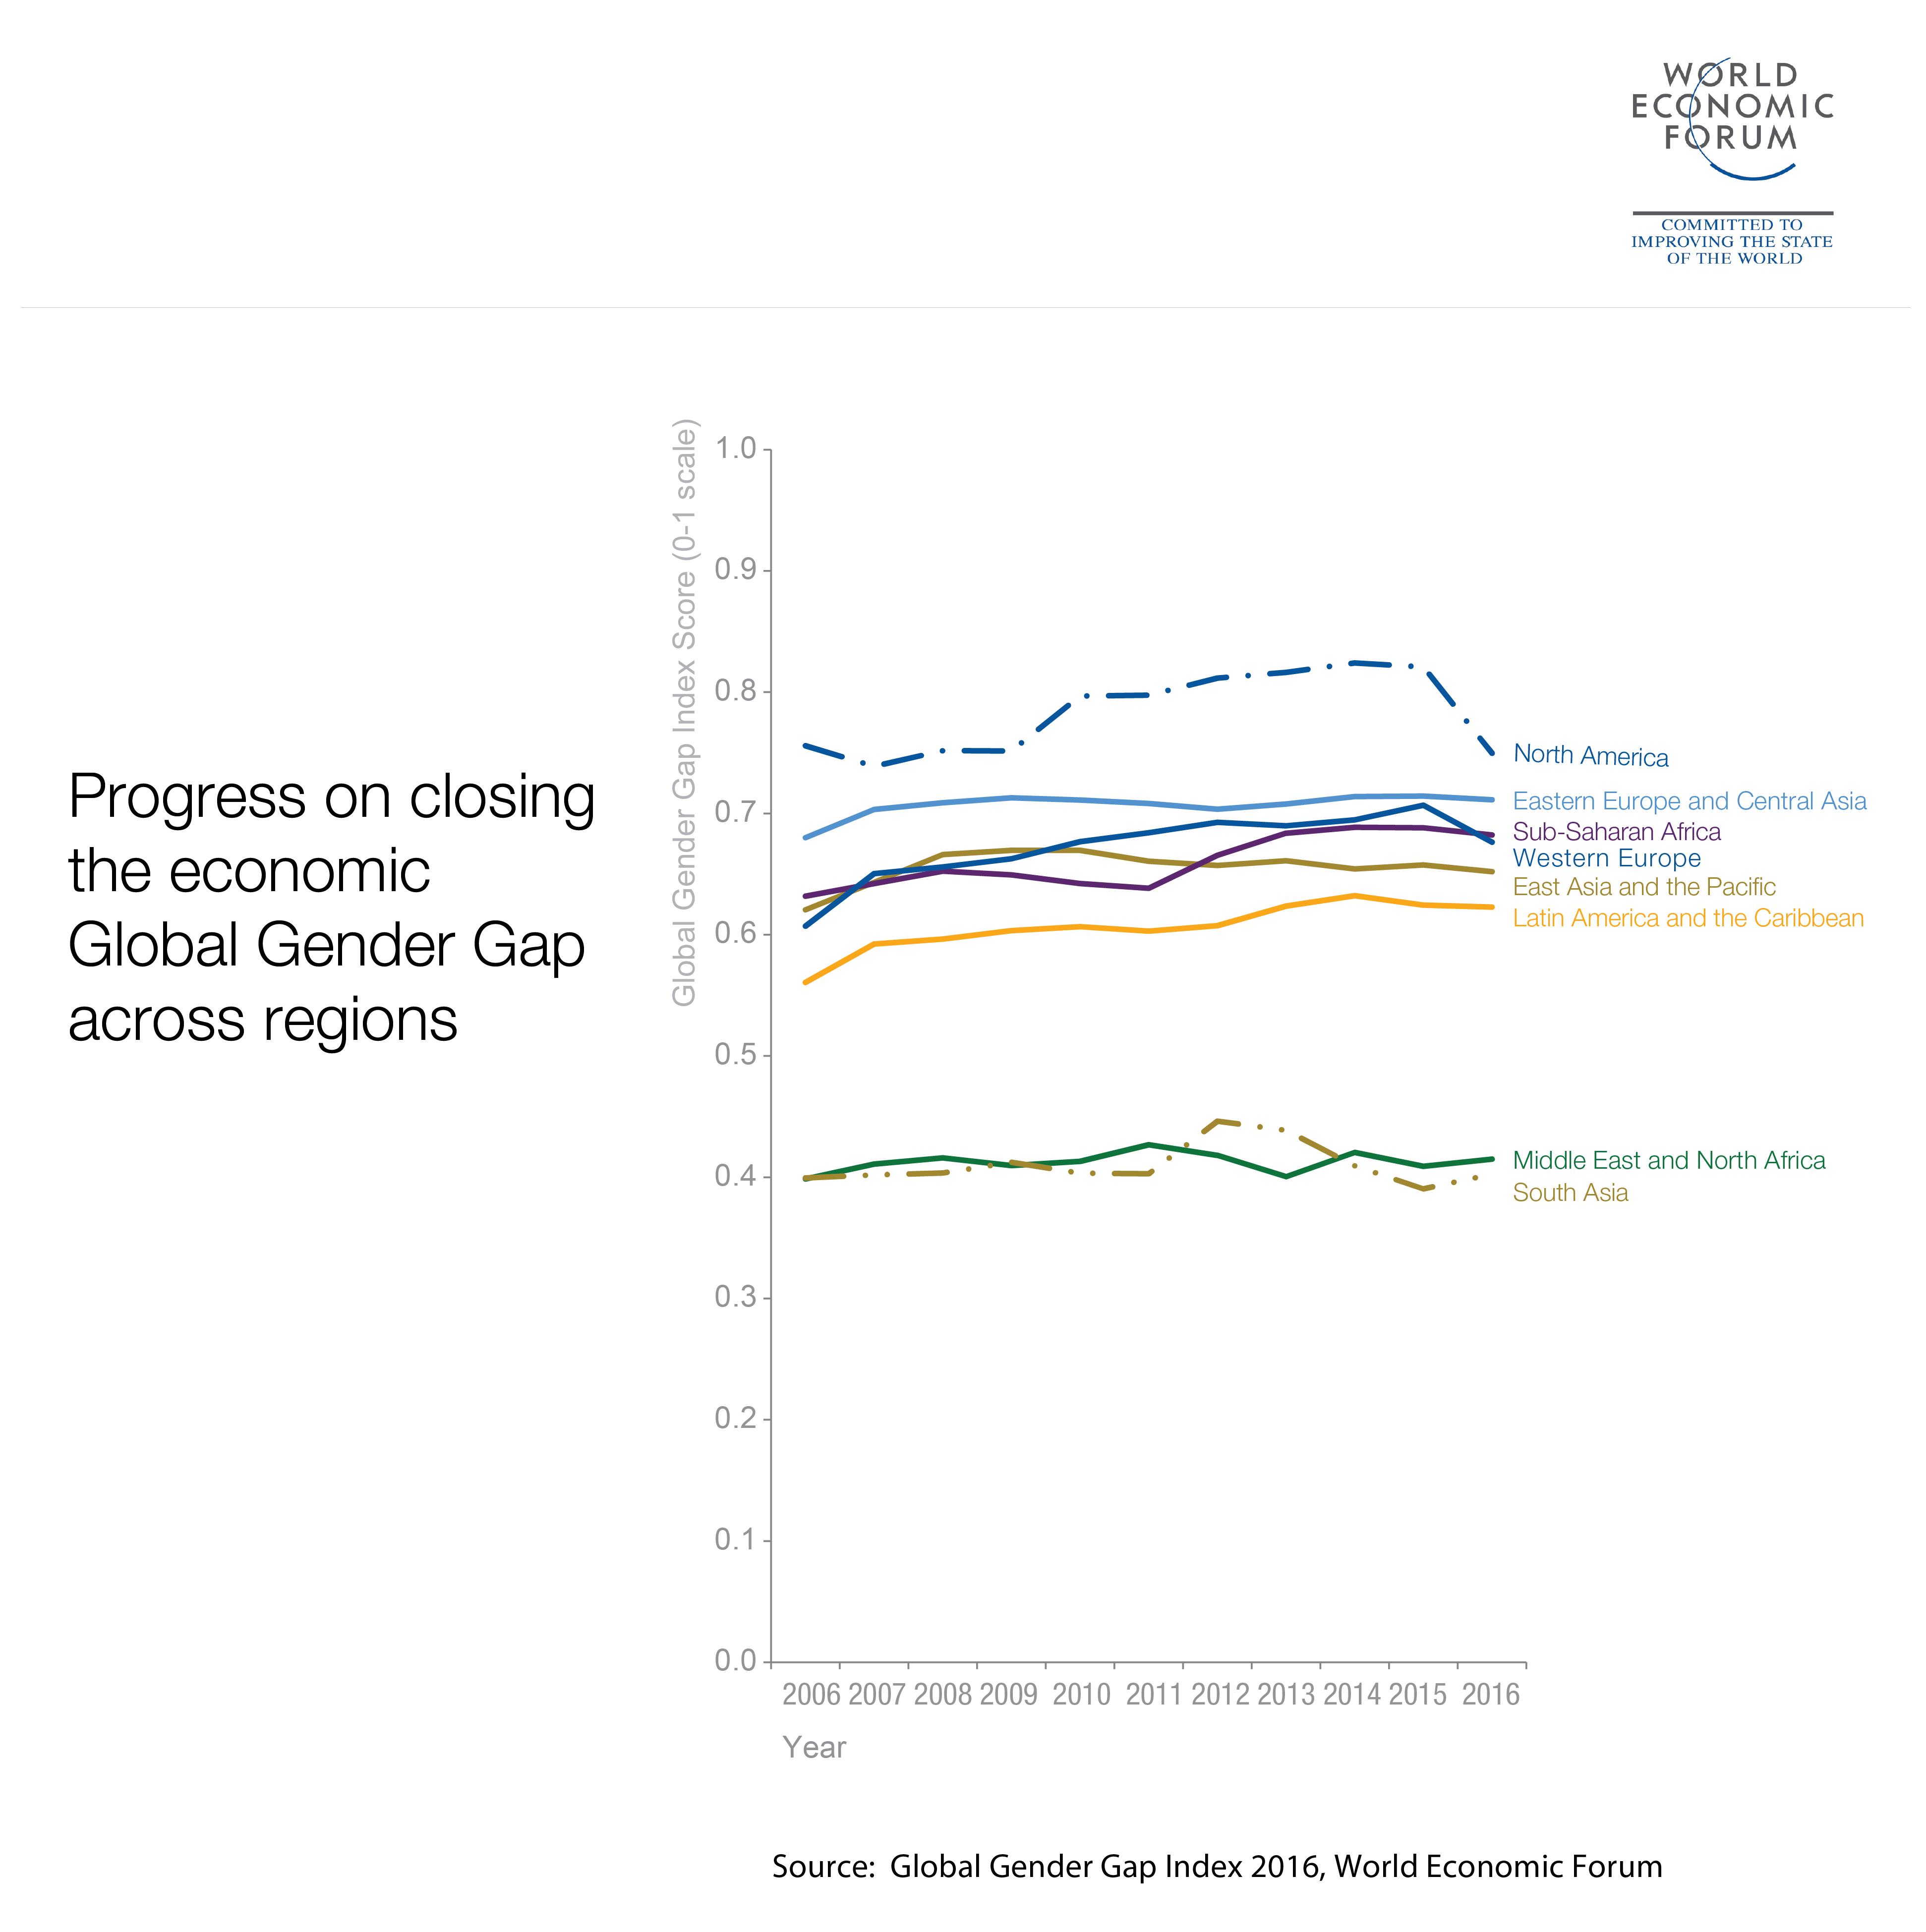 Progress on closing the economic Global Gender Gap across regions